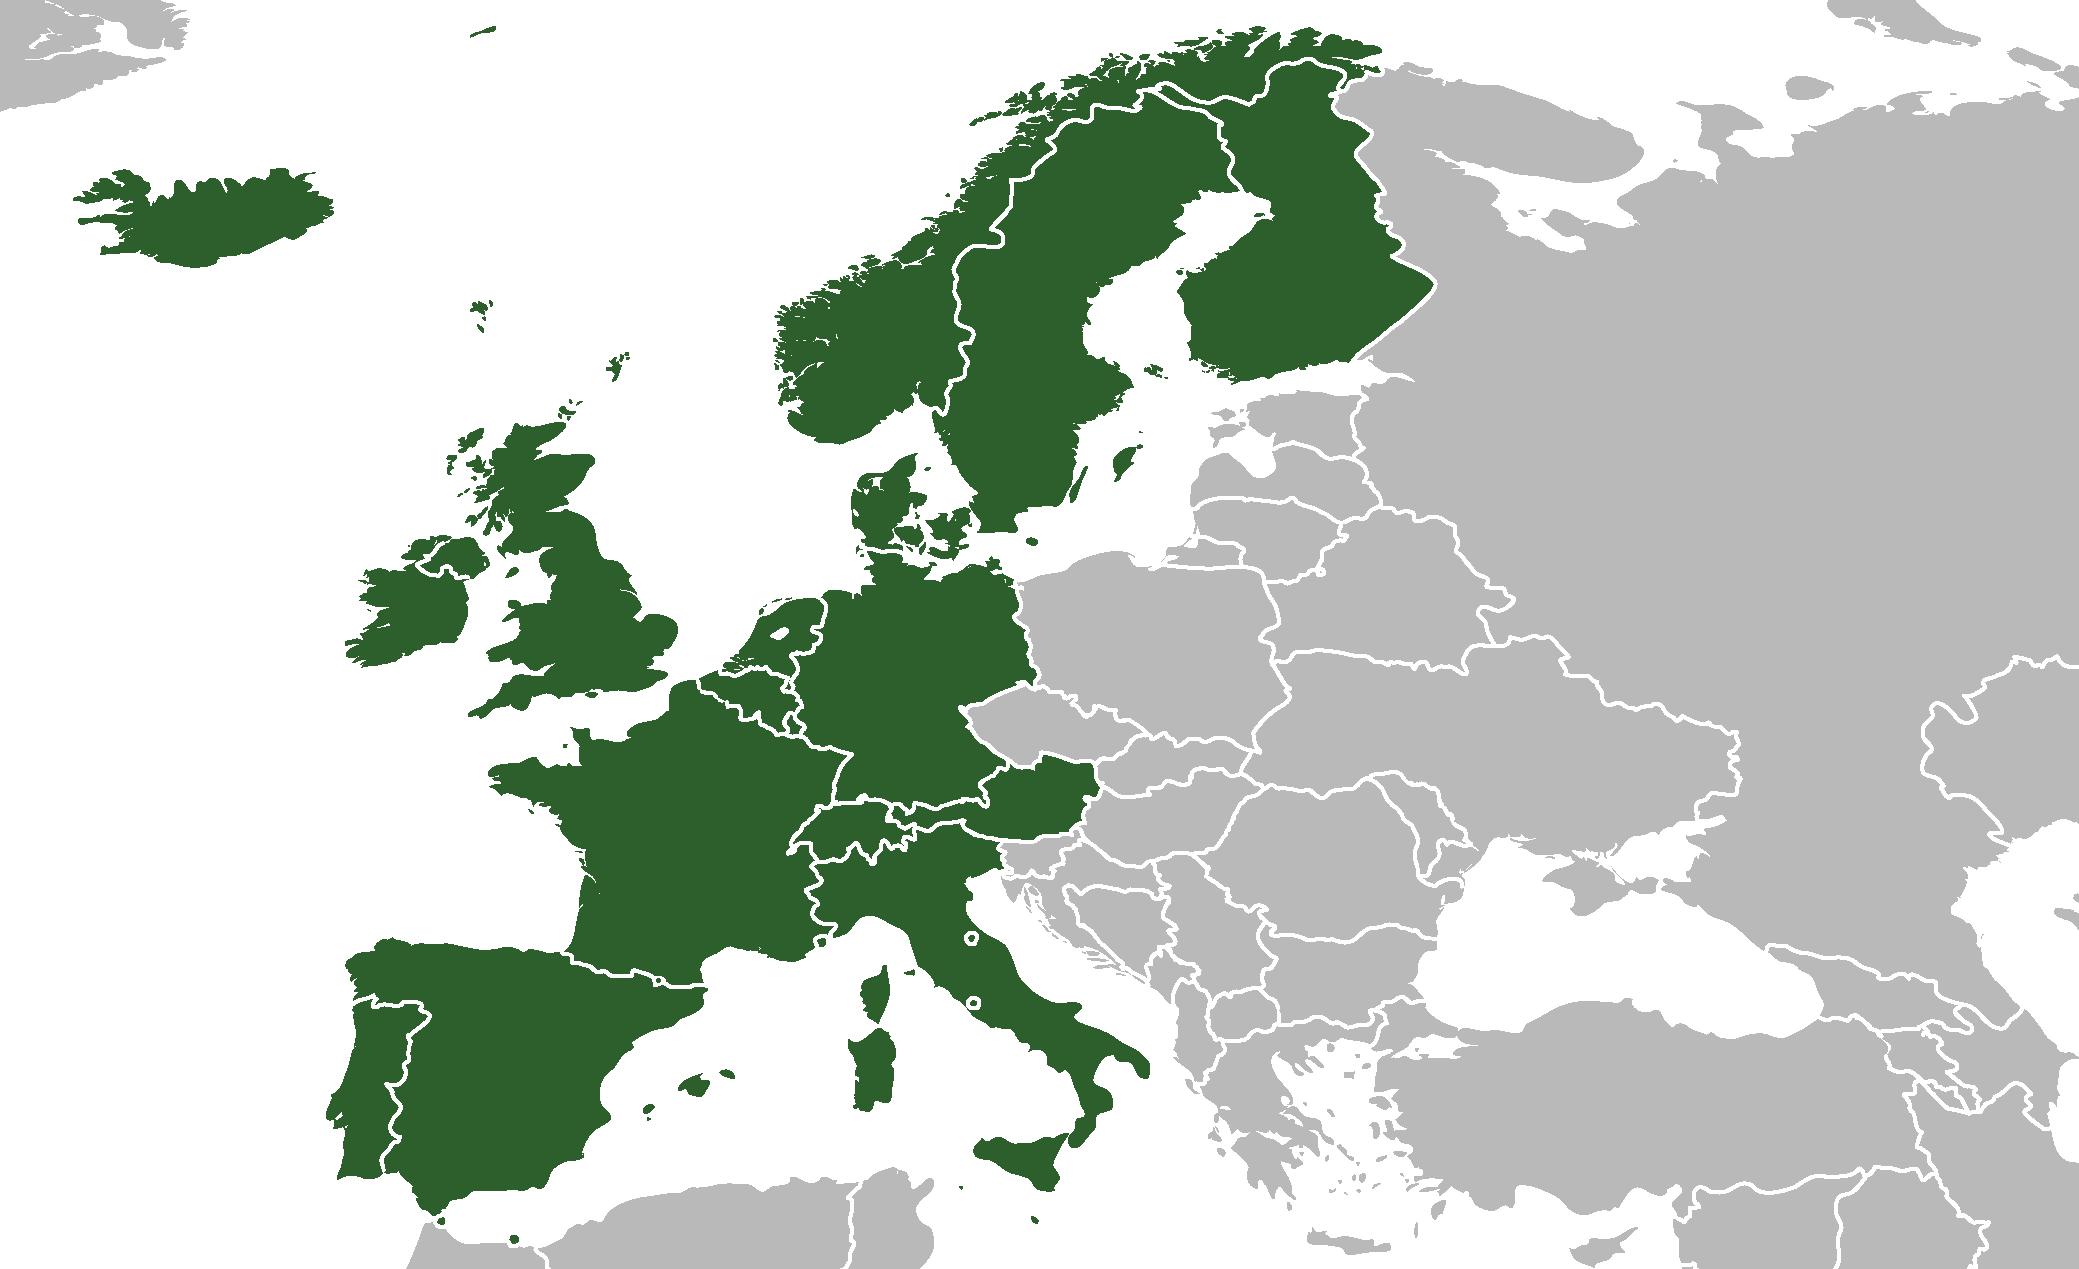 Russia's Hostile Measures in Europe, Understanding the Threat